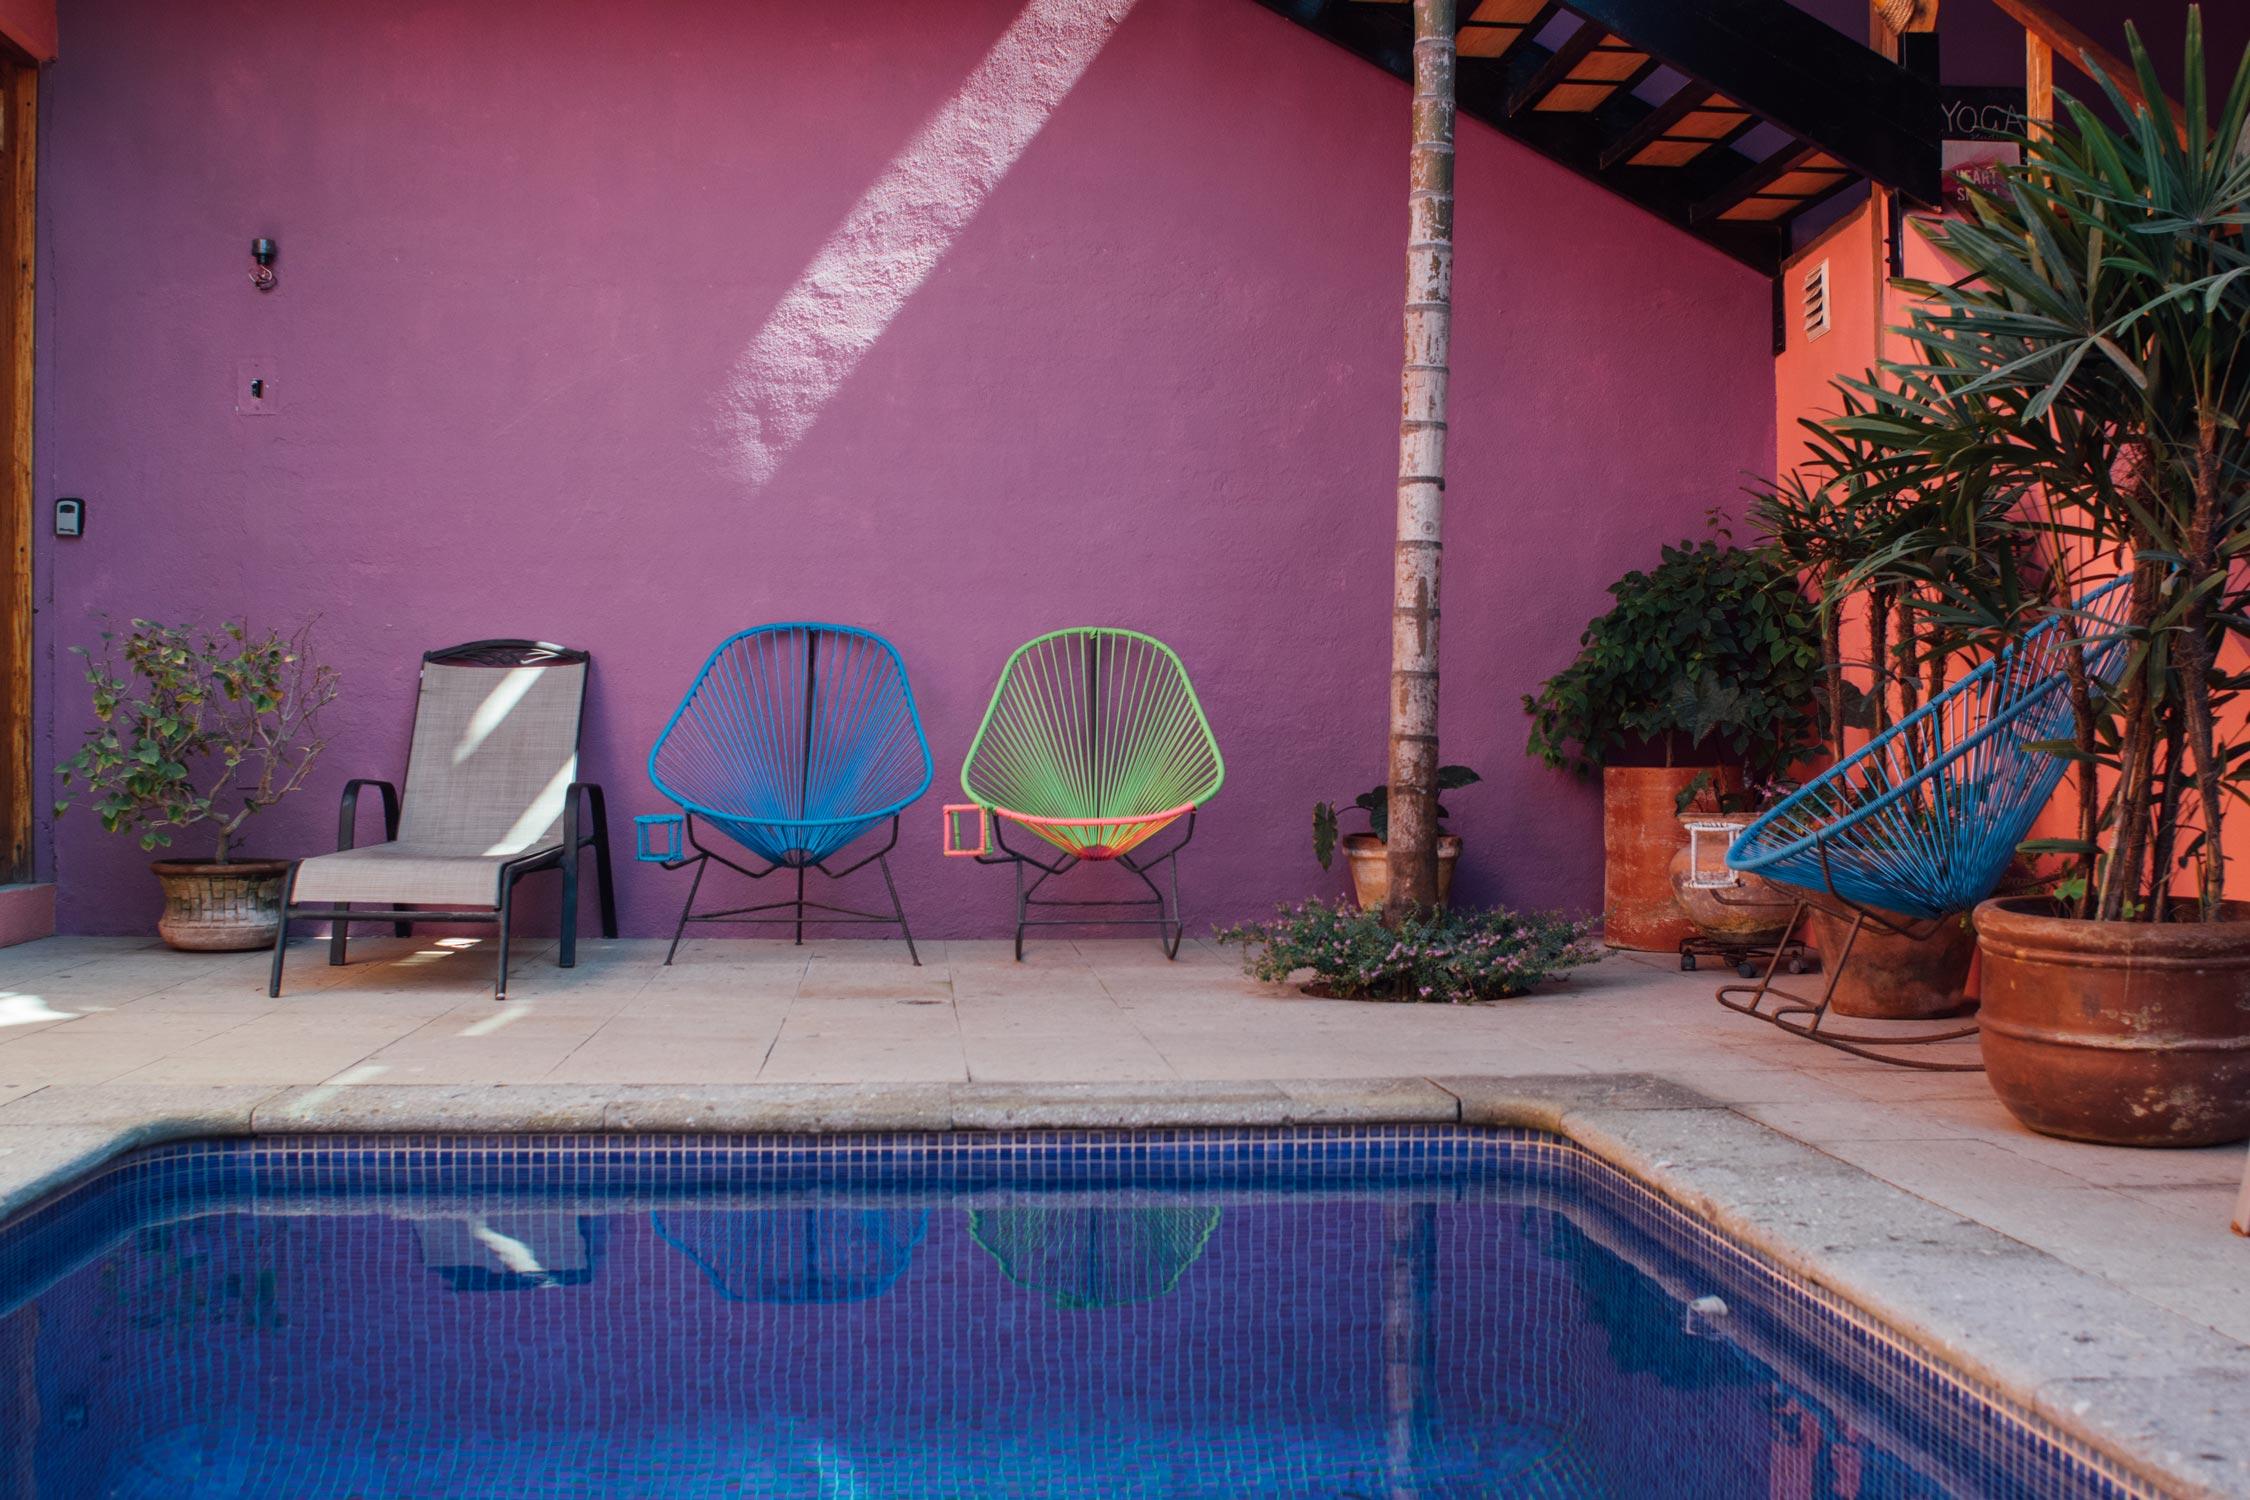 pool-and-chairs.jpg